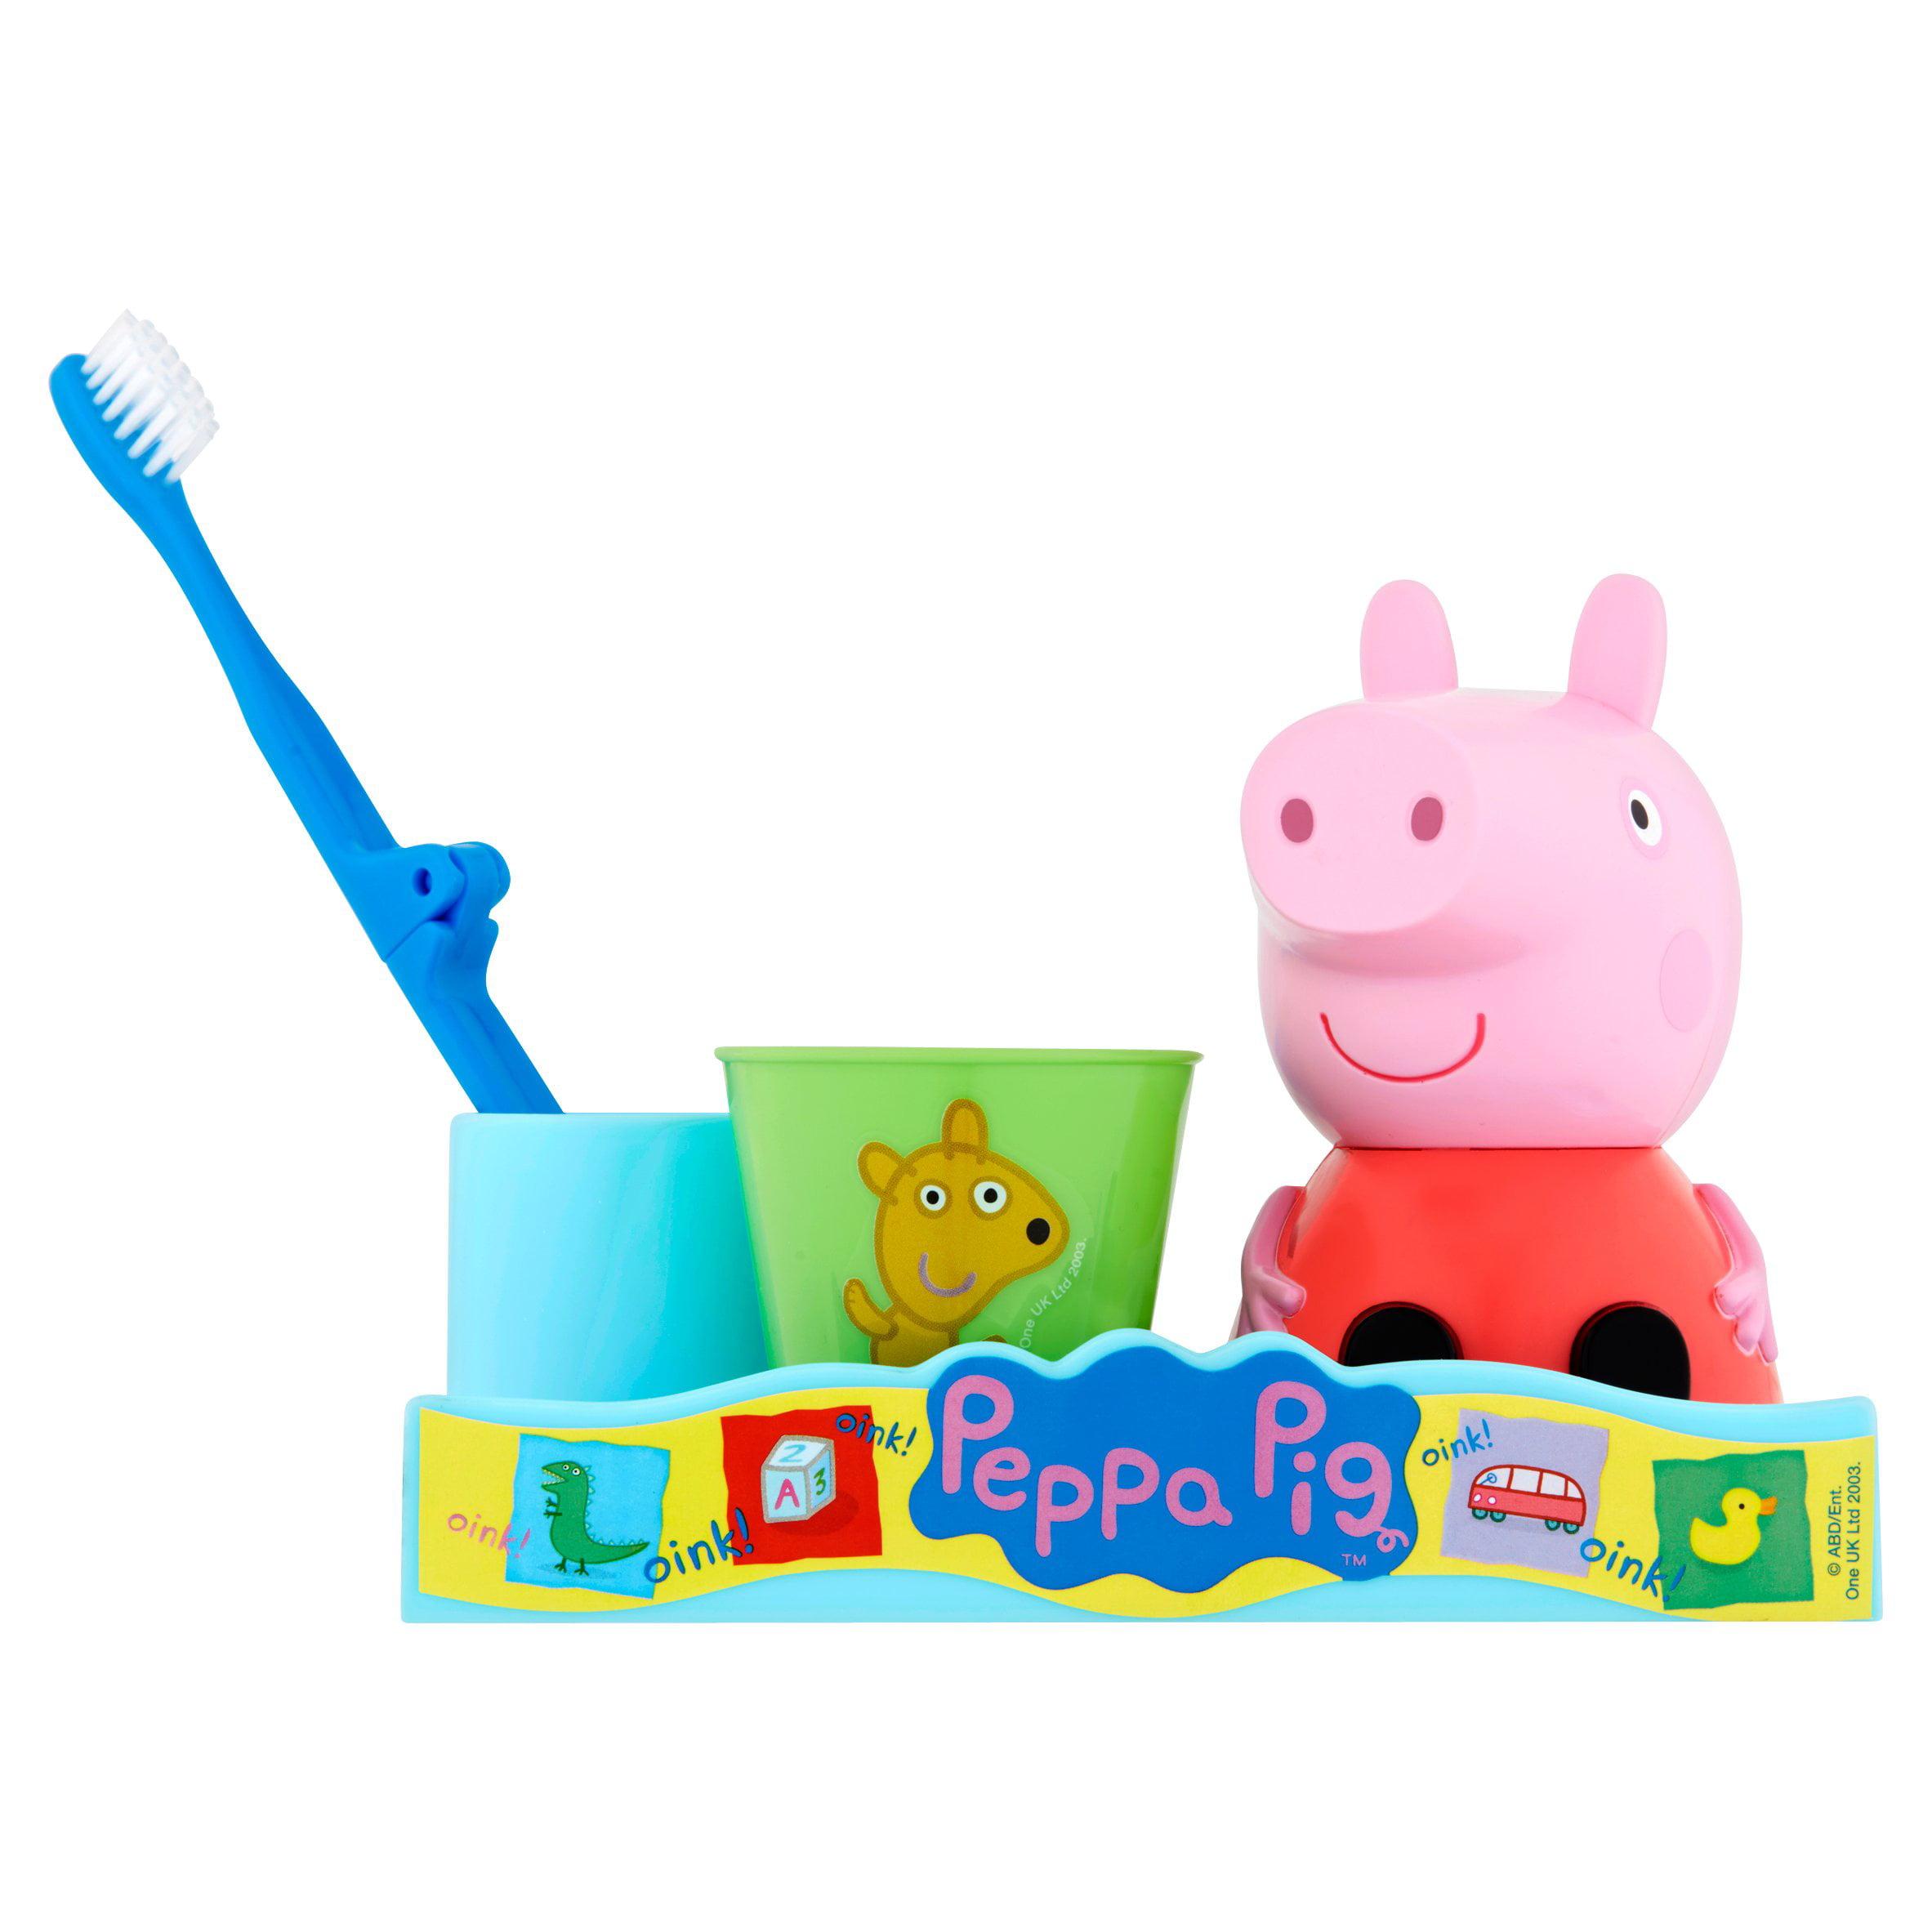 Peppa Pig Toothbrush, Toothbrush Holder, Rinse Cup Gift Set, 3pcs    Walmart.com